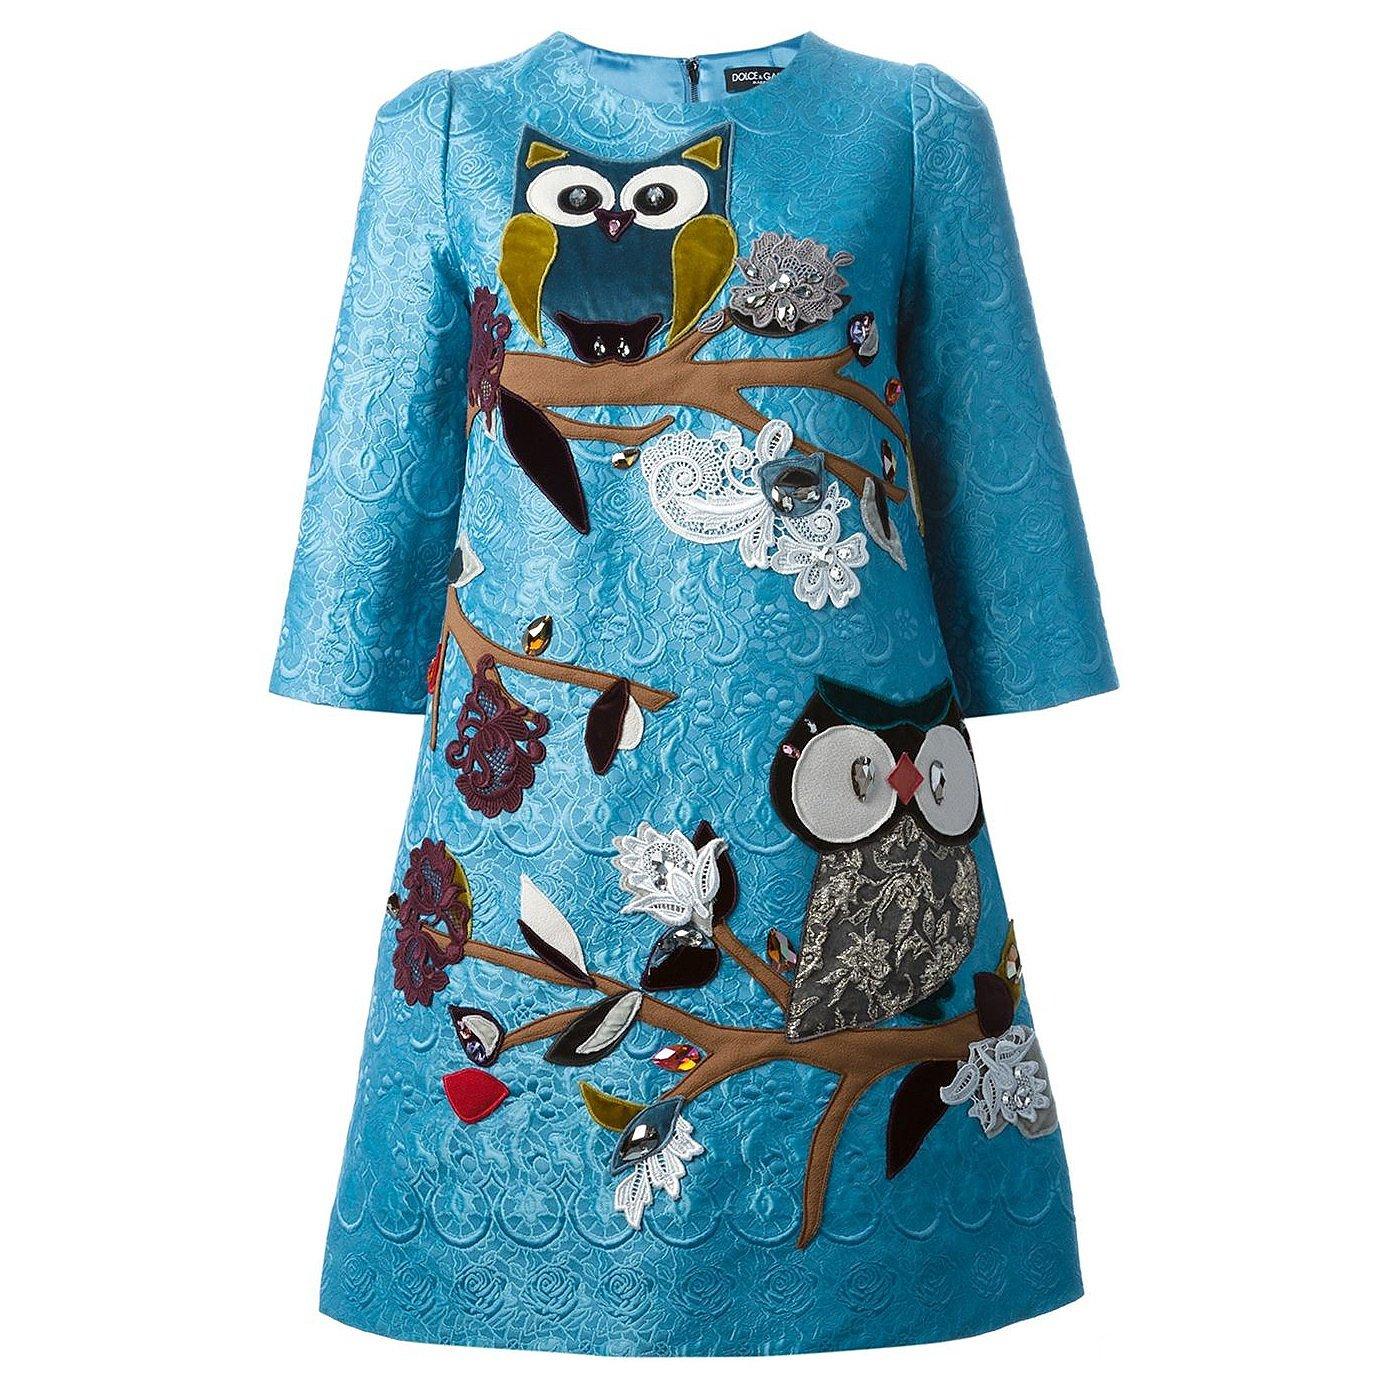 DOLCE & GABBANA Owl Embroidered Dress